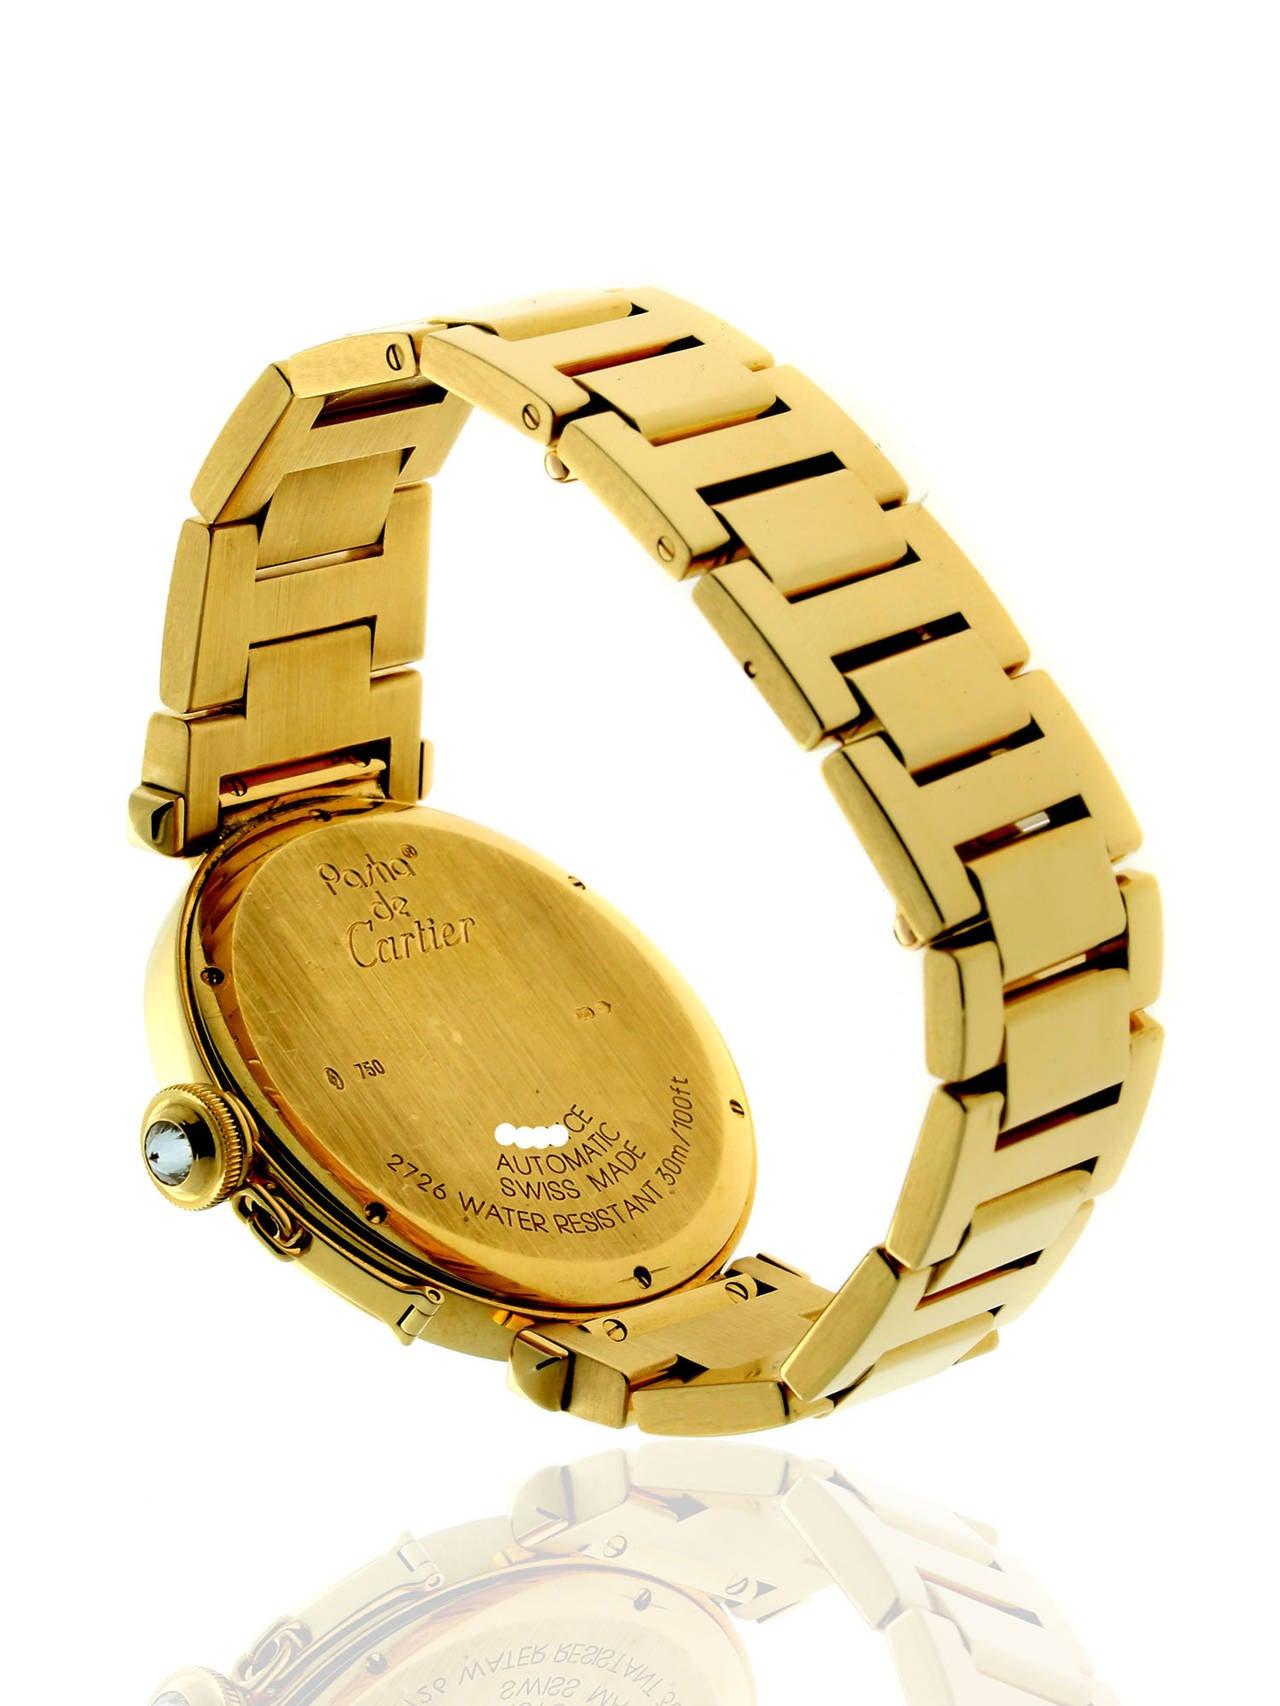 Cartier Yellow Gold Diamond Pasha Wristwatch at 1stdibs